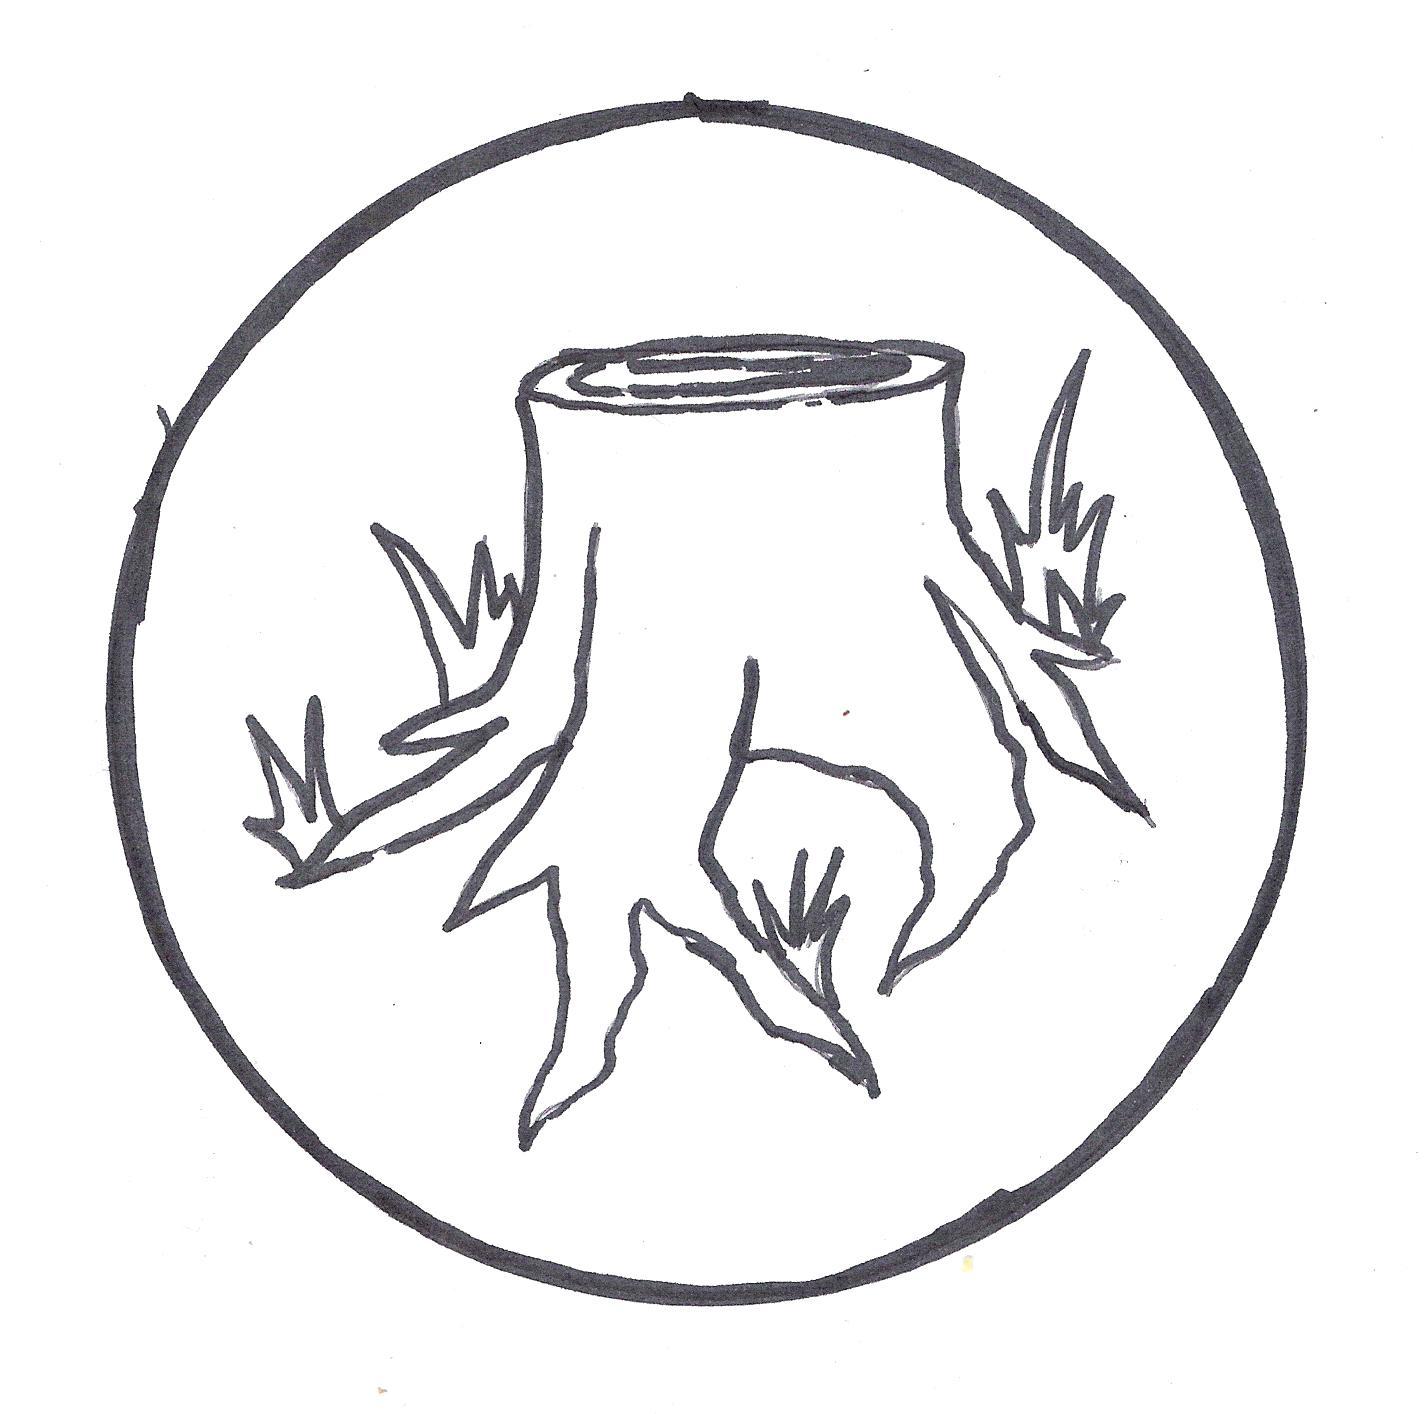 jesse tree symbols coloring pages - photo#31